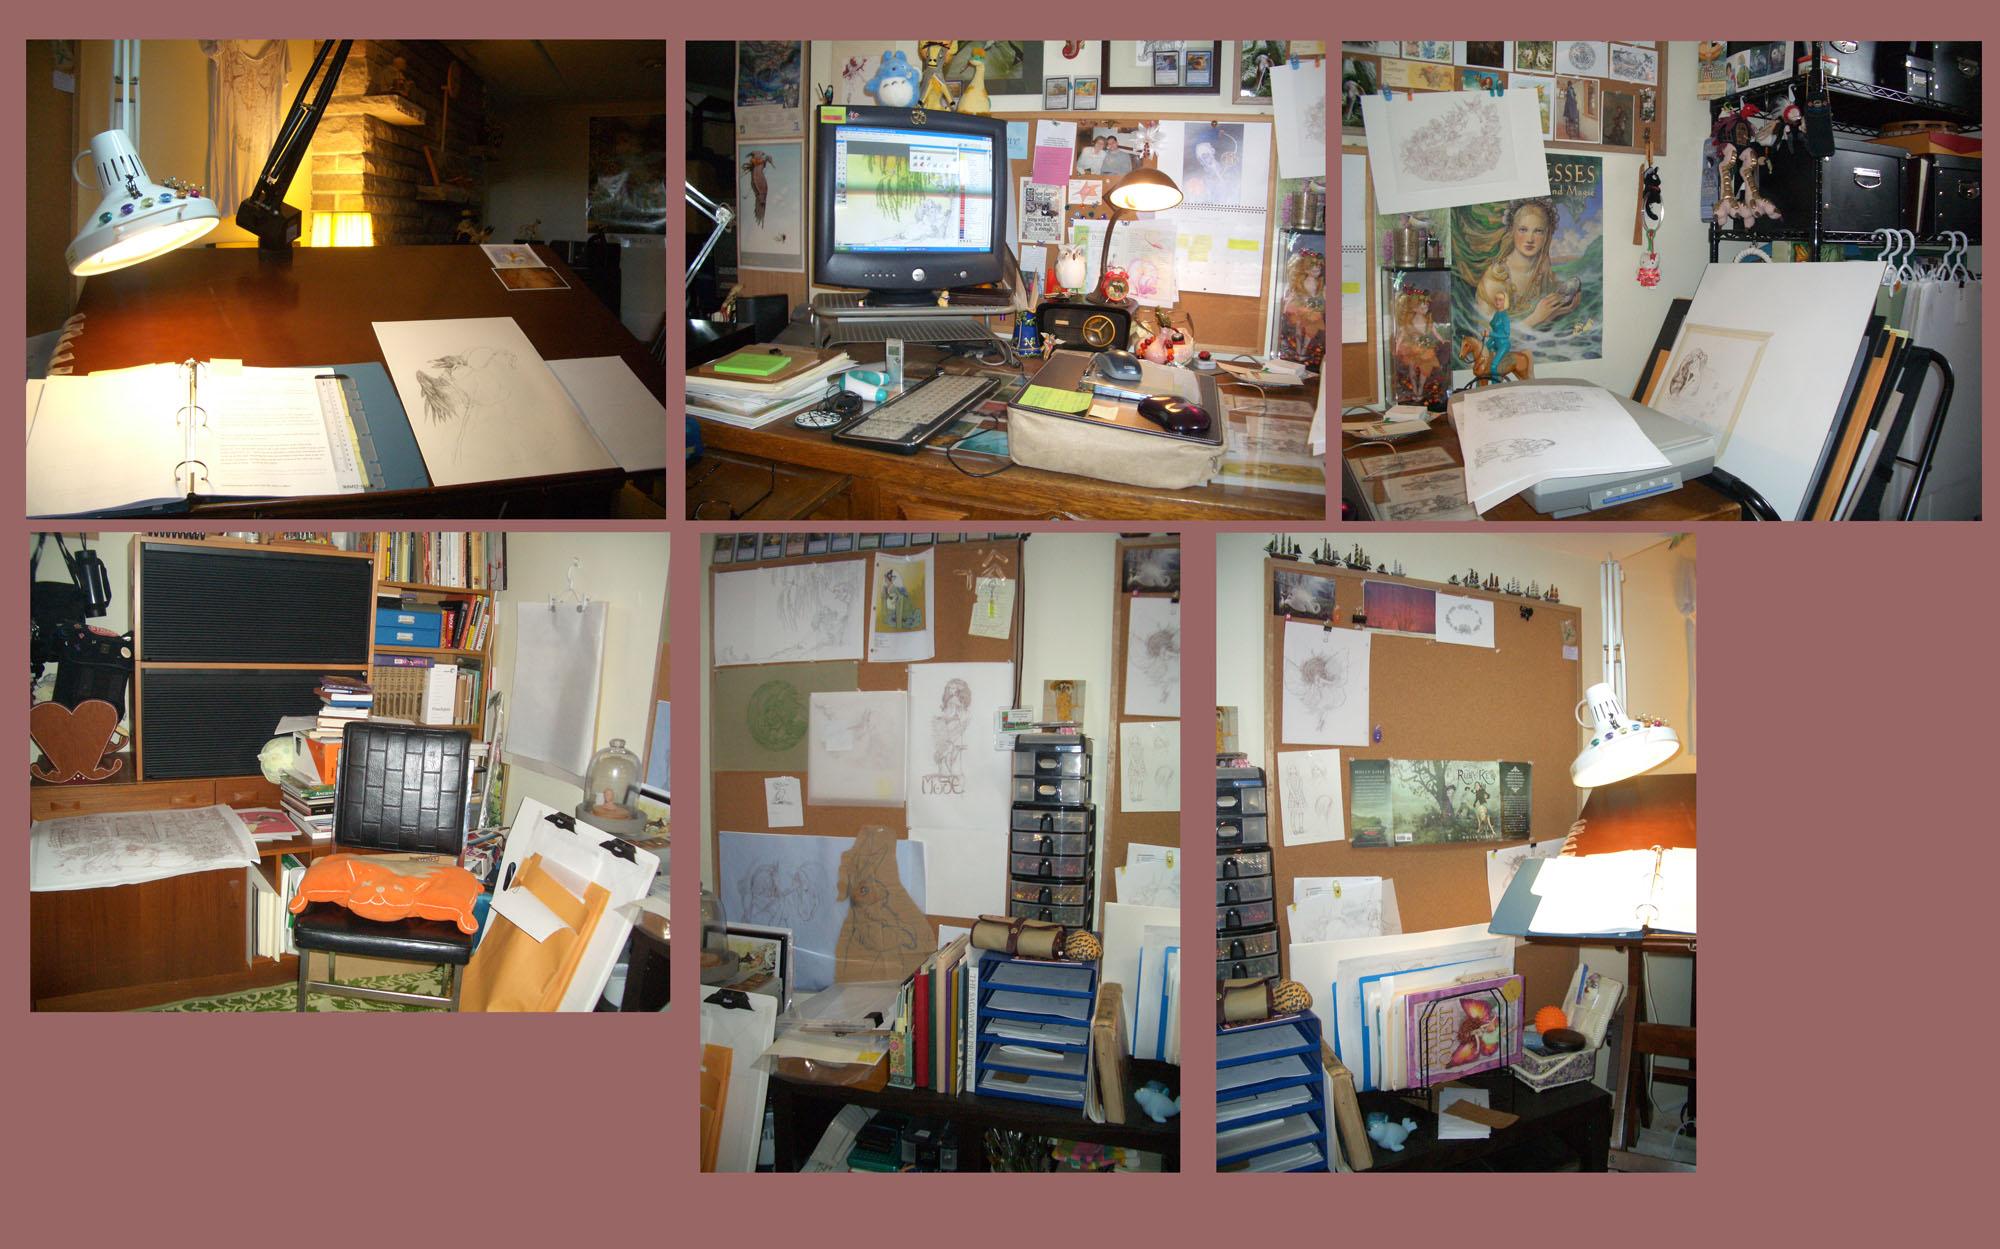 My Messy Studio by betta-girl